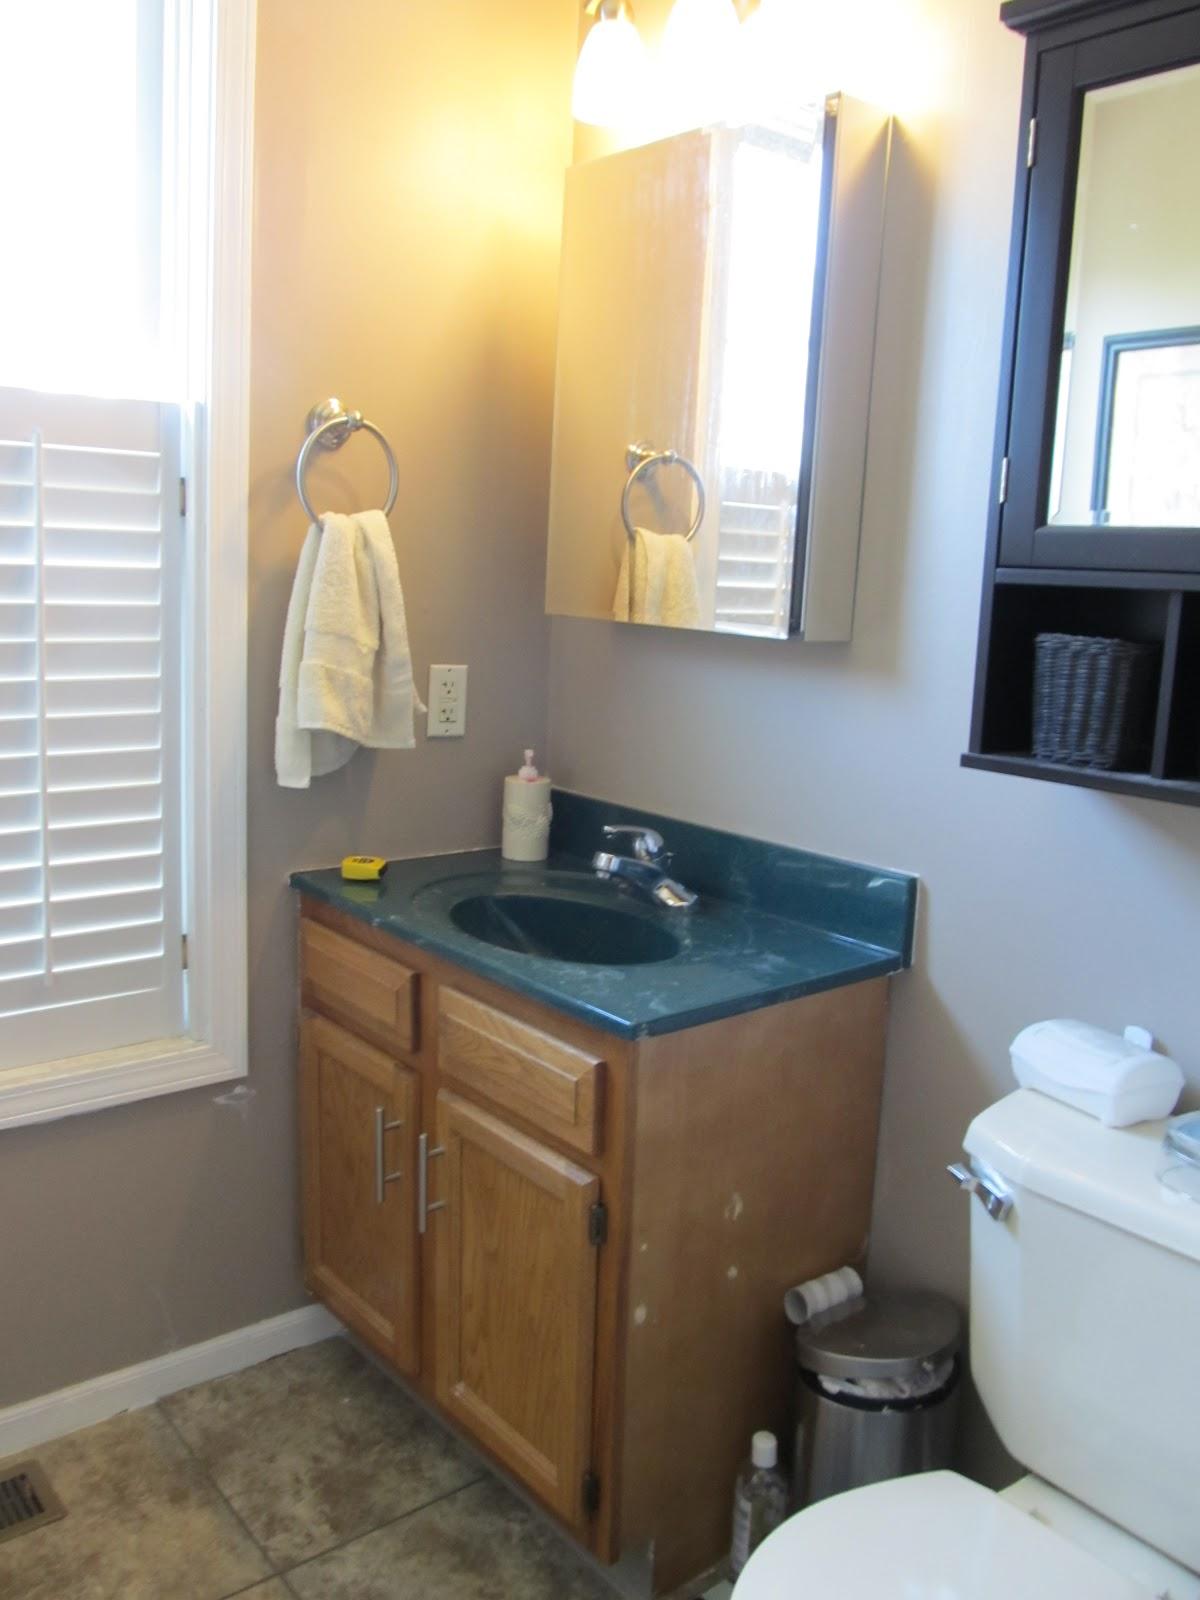 Charlie The Cavalier : 4 Steps to Update Your Bathroom Vanity